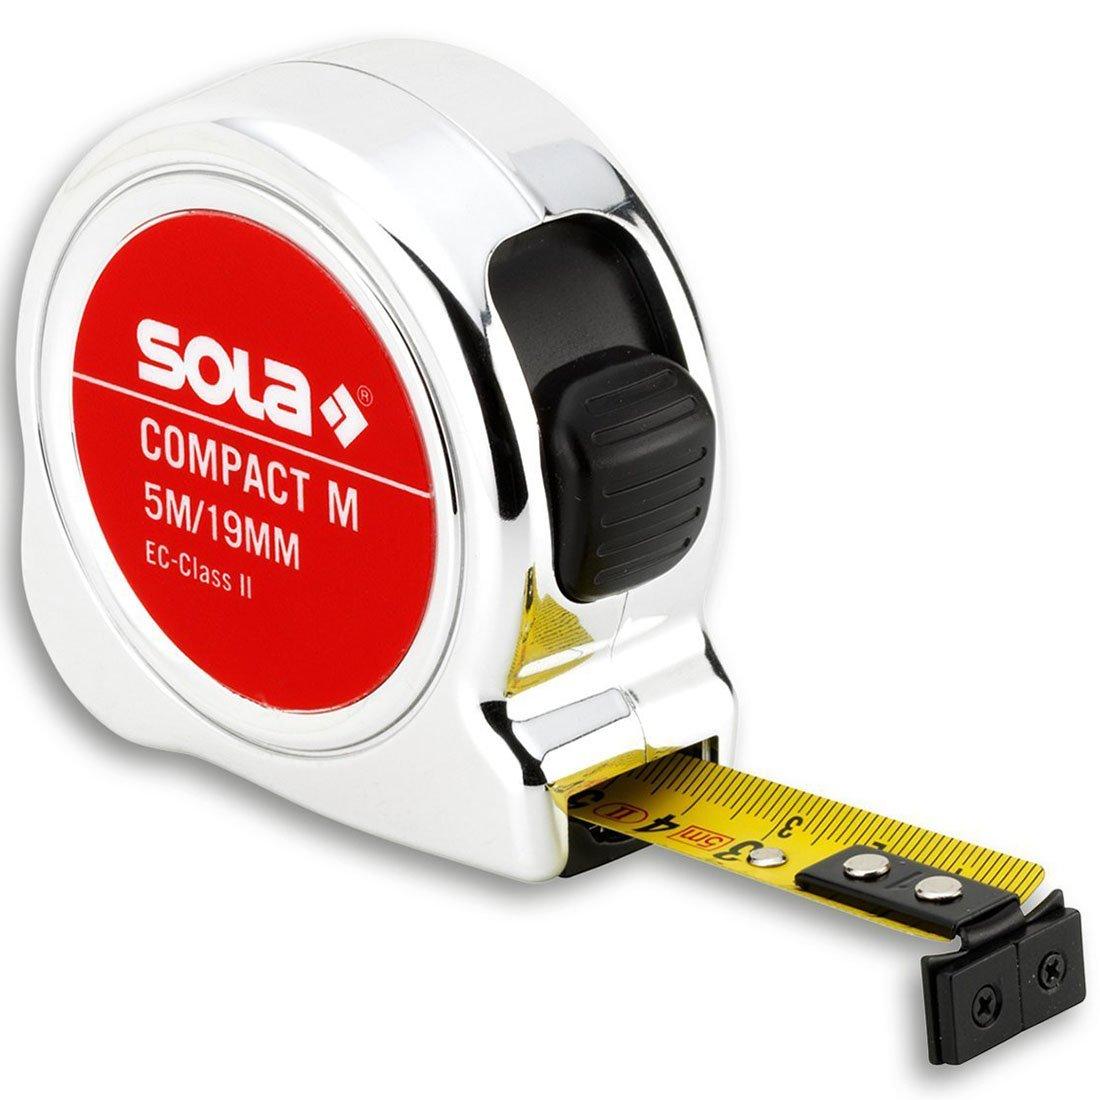 5m Grau Sola 50520501 Magnetrollbandma/ßCompact M CO 5